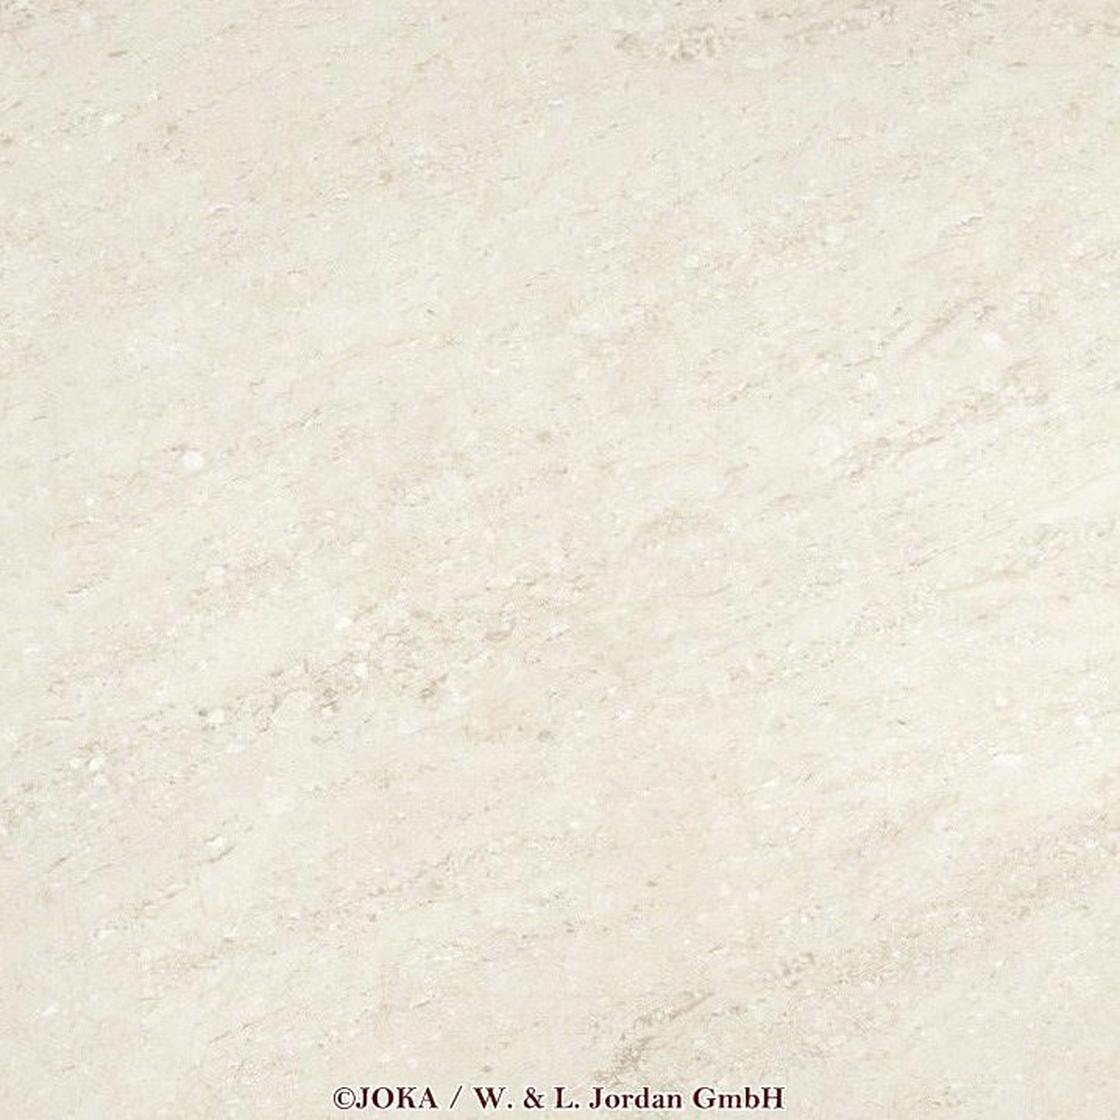 joka design 230 hdf - exposed concrete 4512 klick-vinylboden